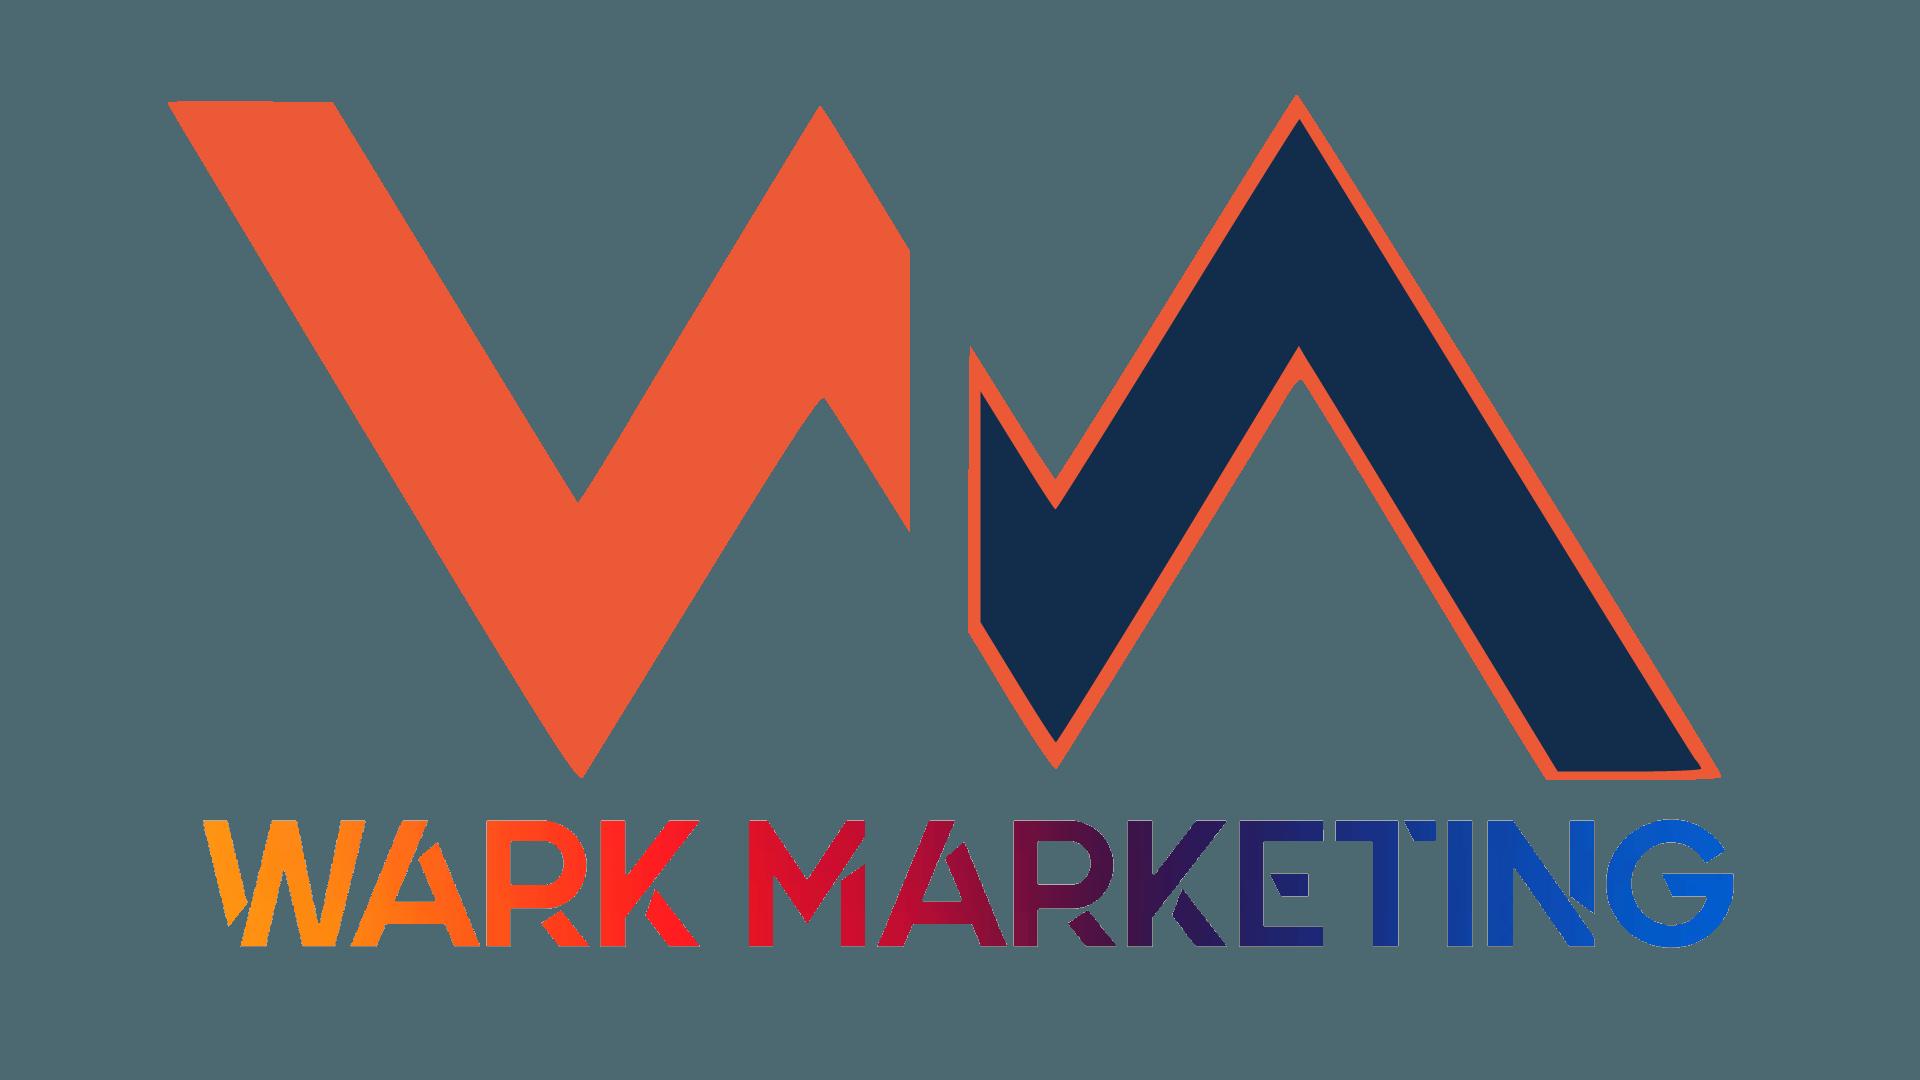 WARK MARKETING